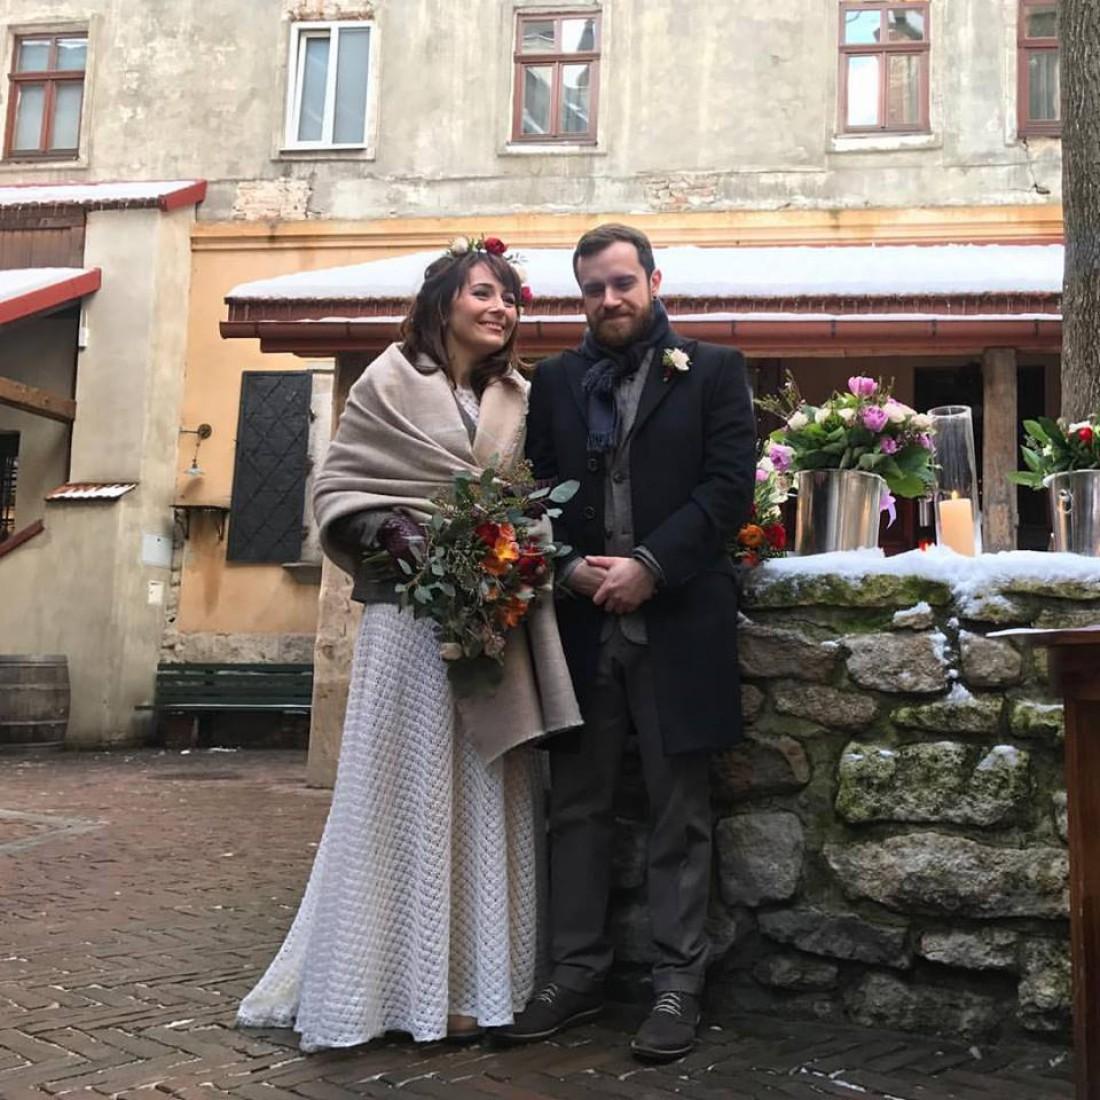 Даша Малахова в третий раз вышла замуж